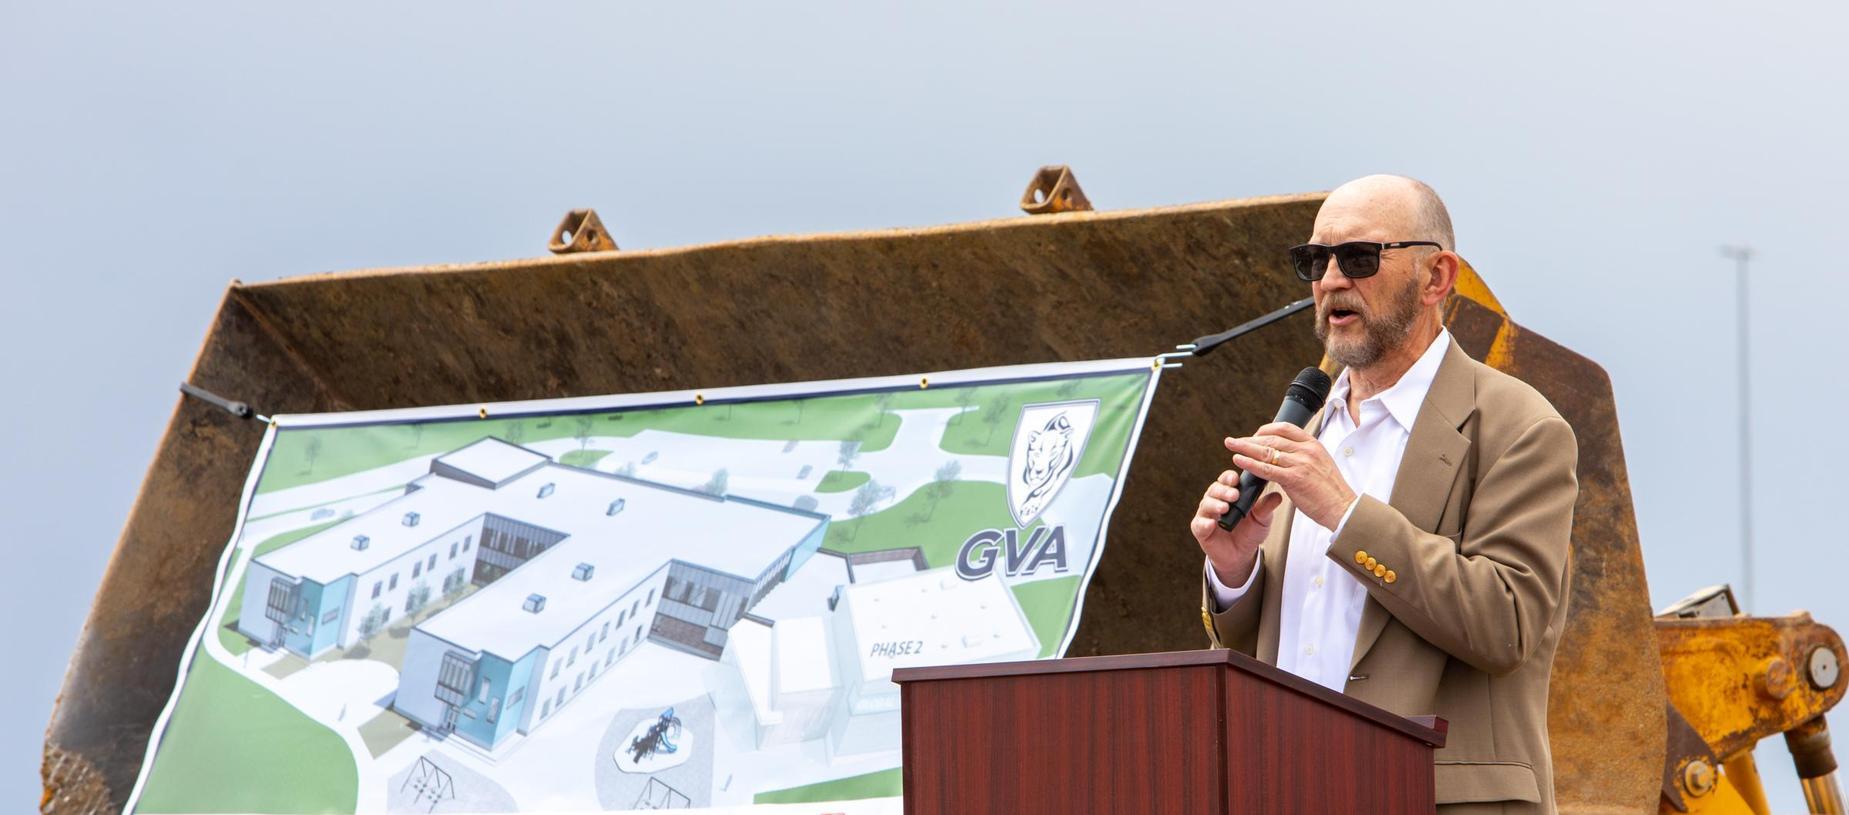 GVA Northglenn Board of Directors President, Ray Sullivan, Speaking at Groundbreaking Ceremony